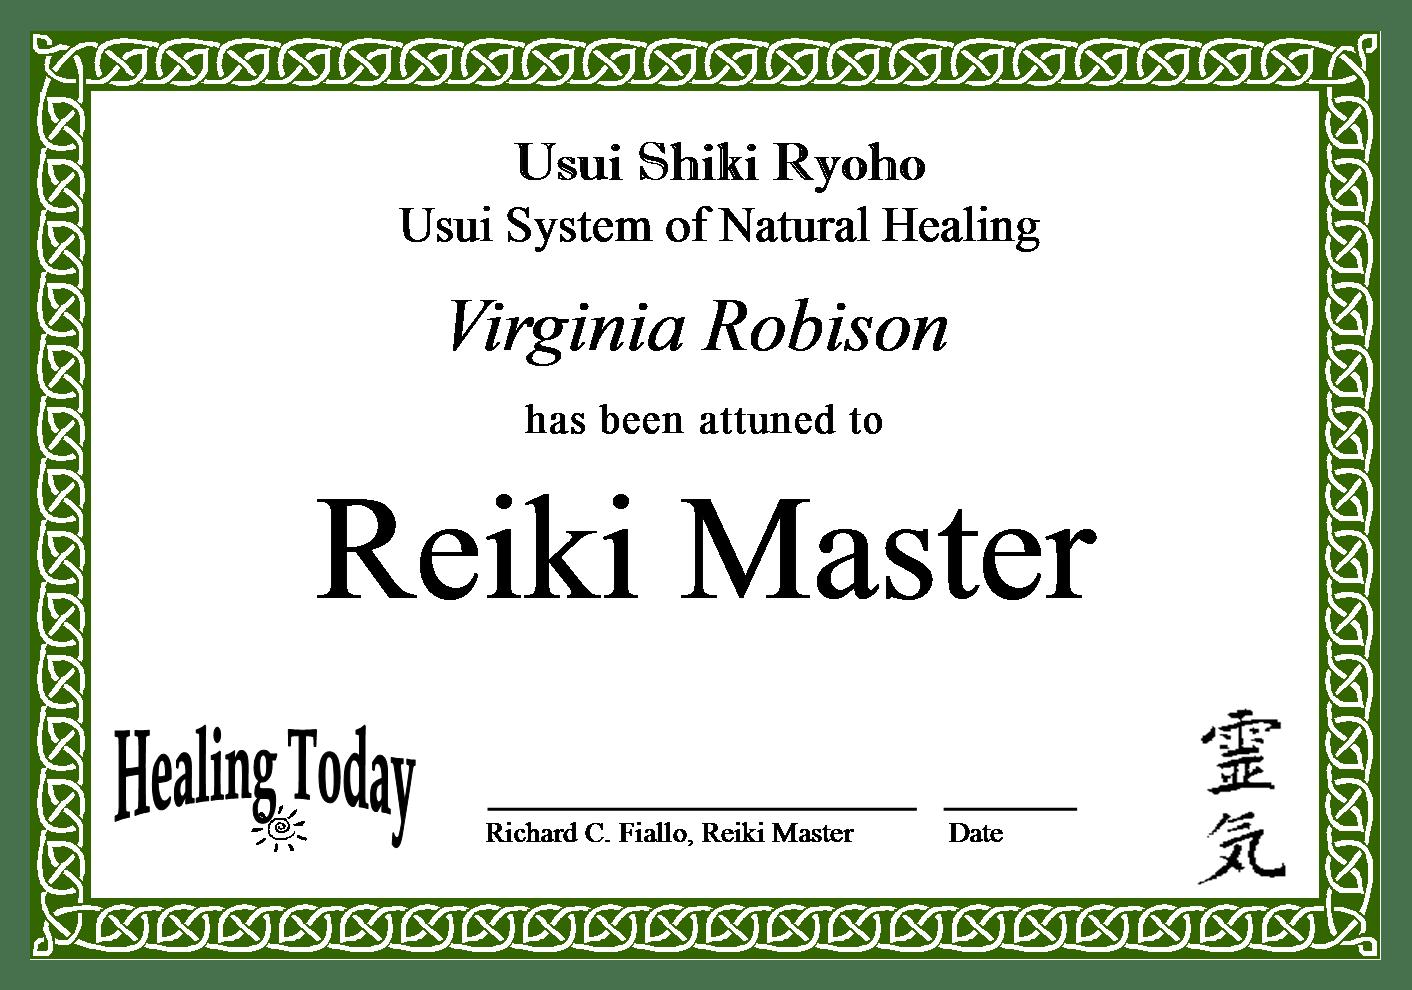 Reiki certificates download free passionative reiki certificates download free buycottarizona Images